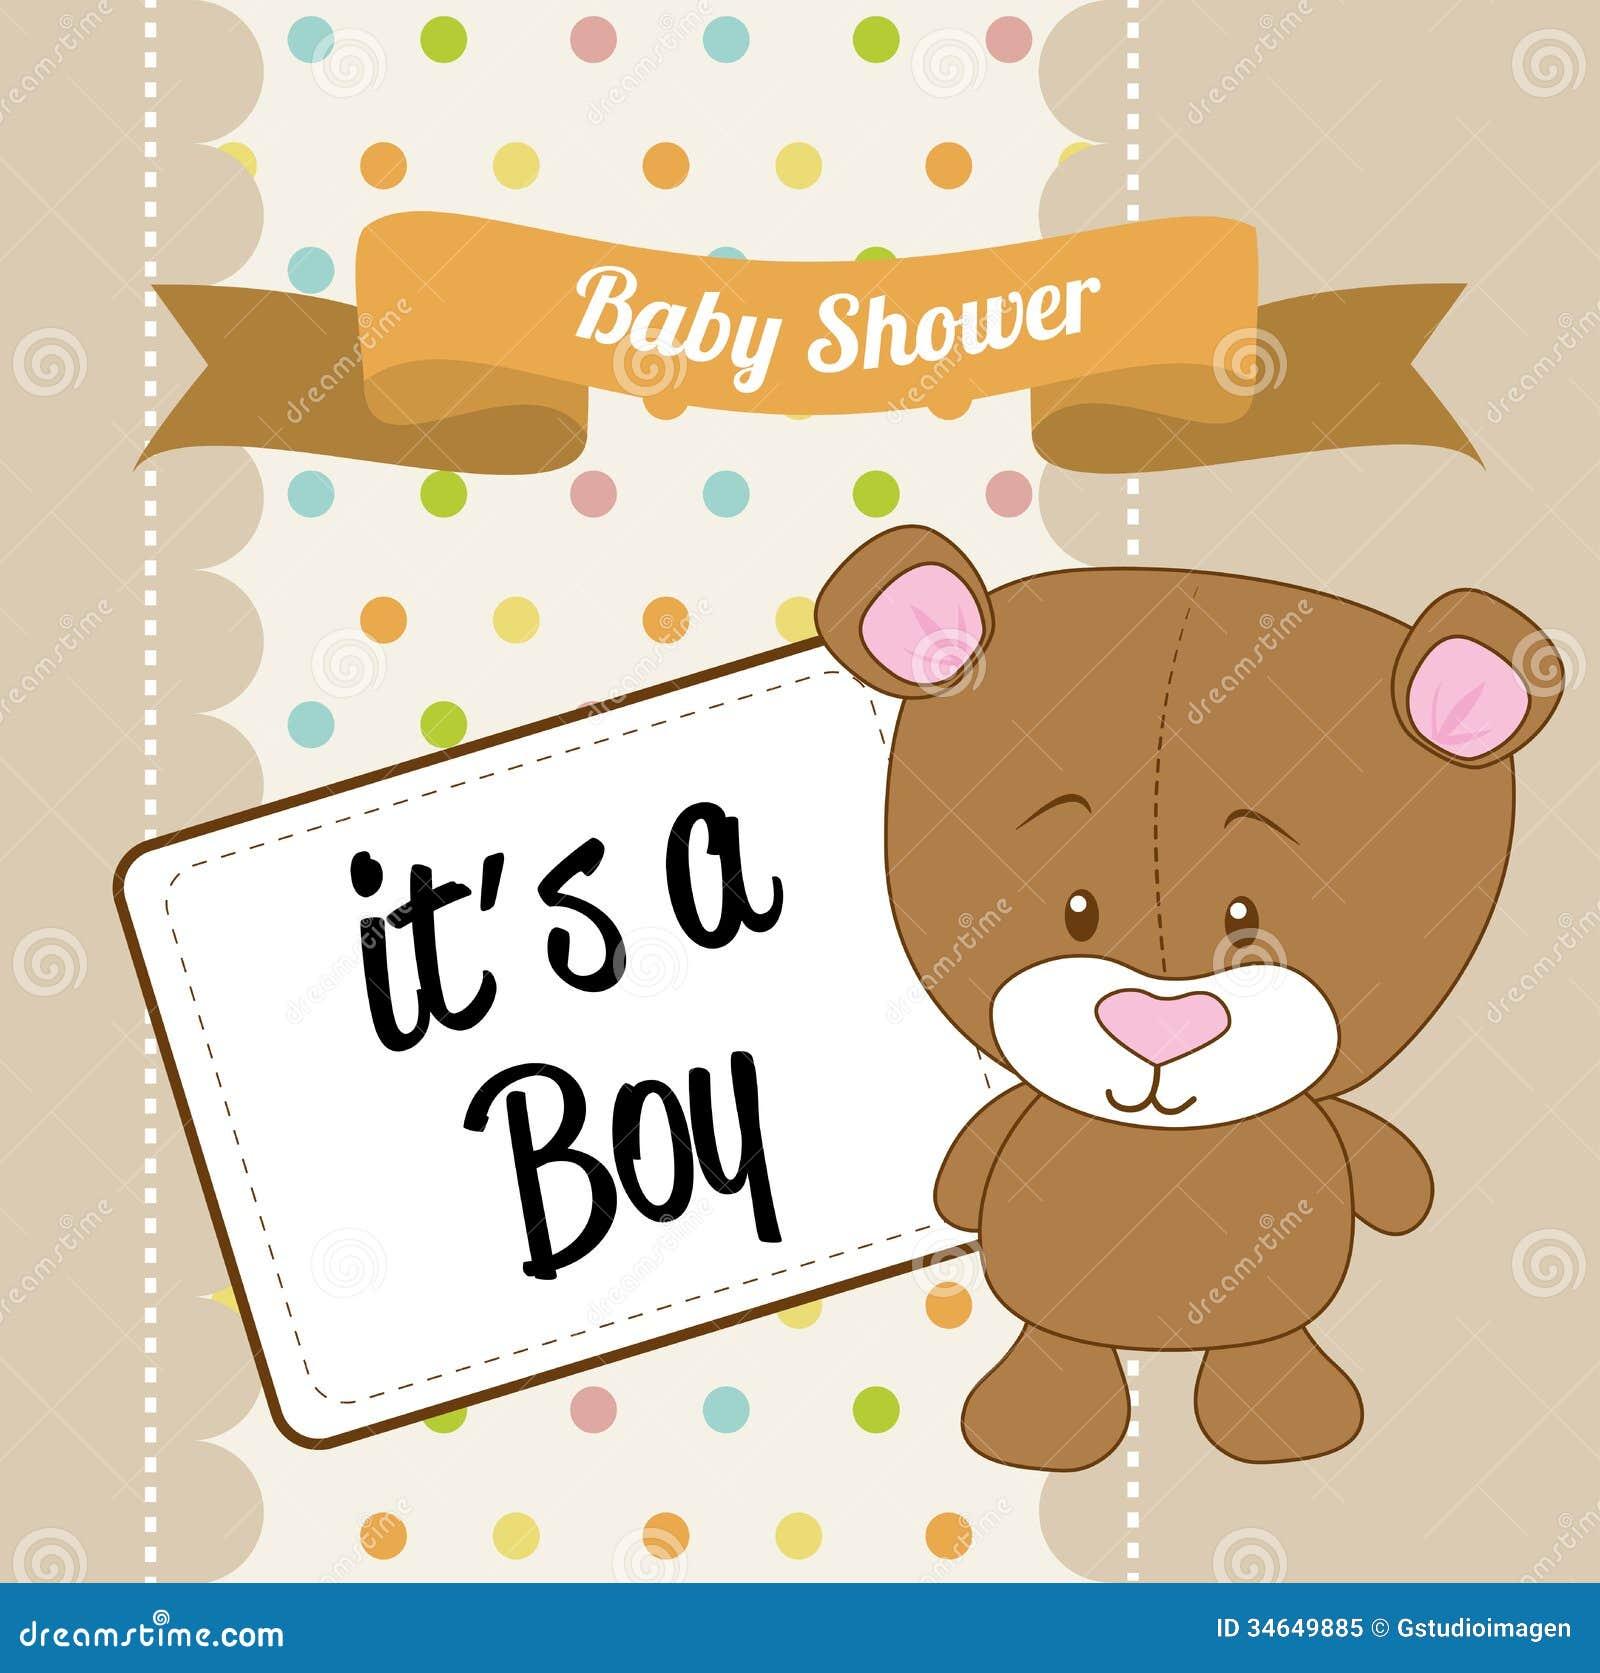 baby shower design royalty free stock photo image 34649885